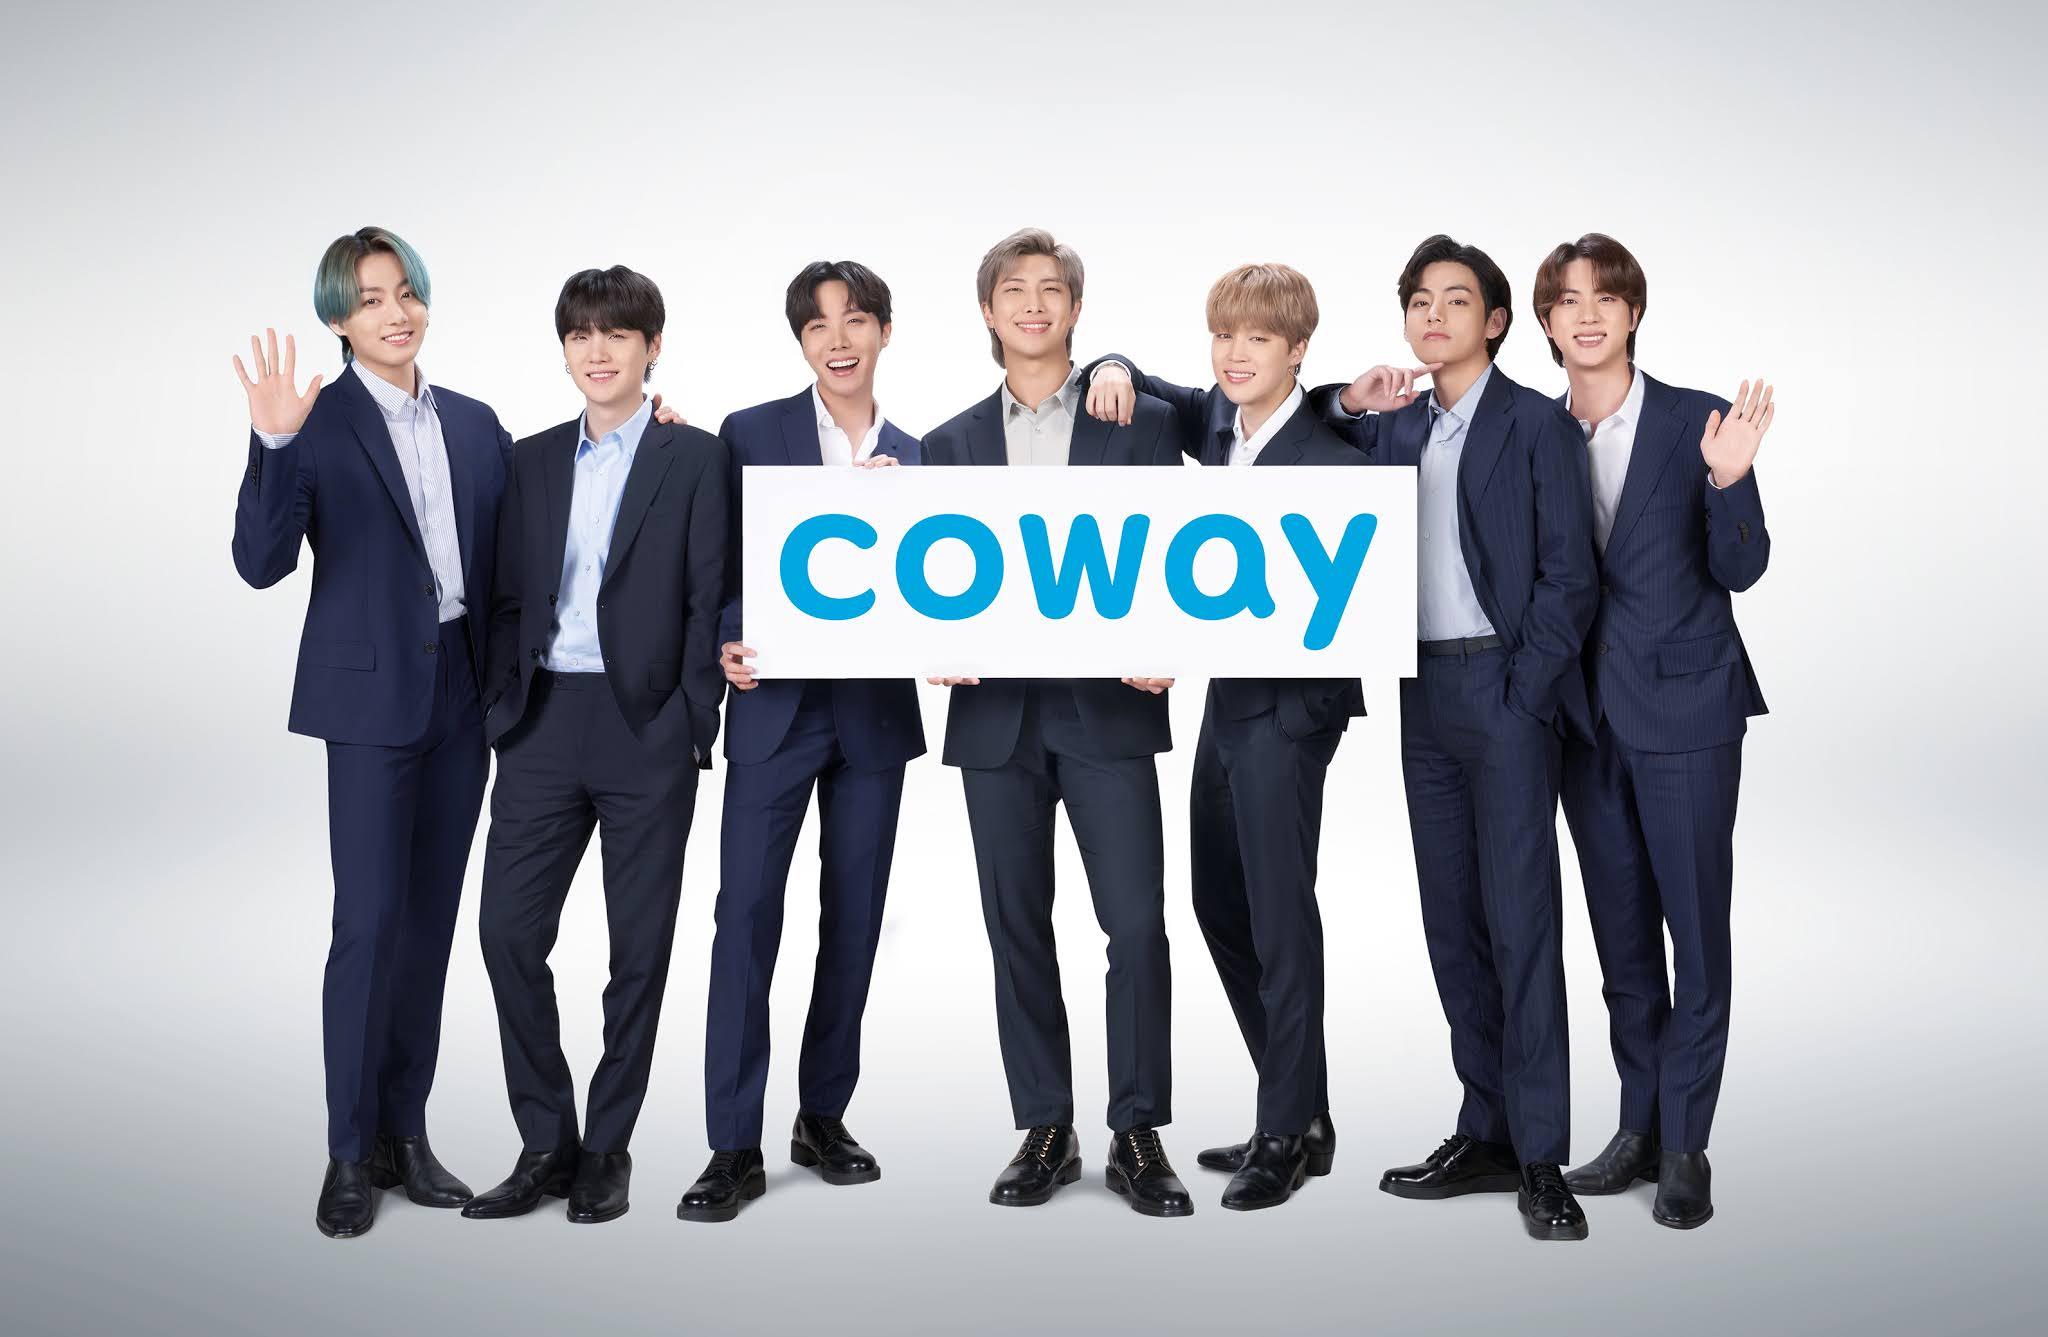 Coway Memilih BTS Sebagai Duta Jenama Global